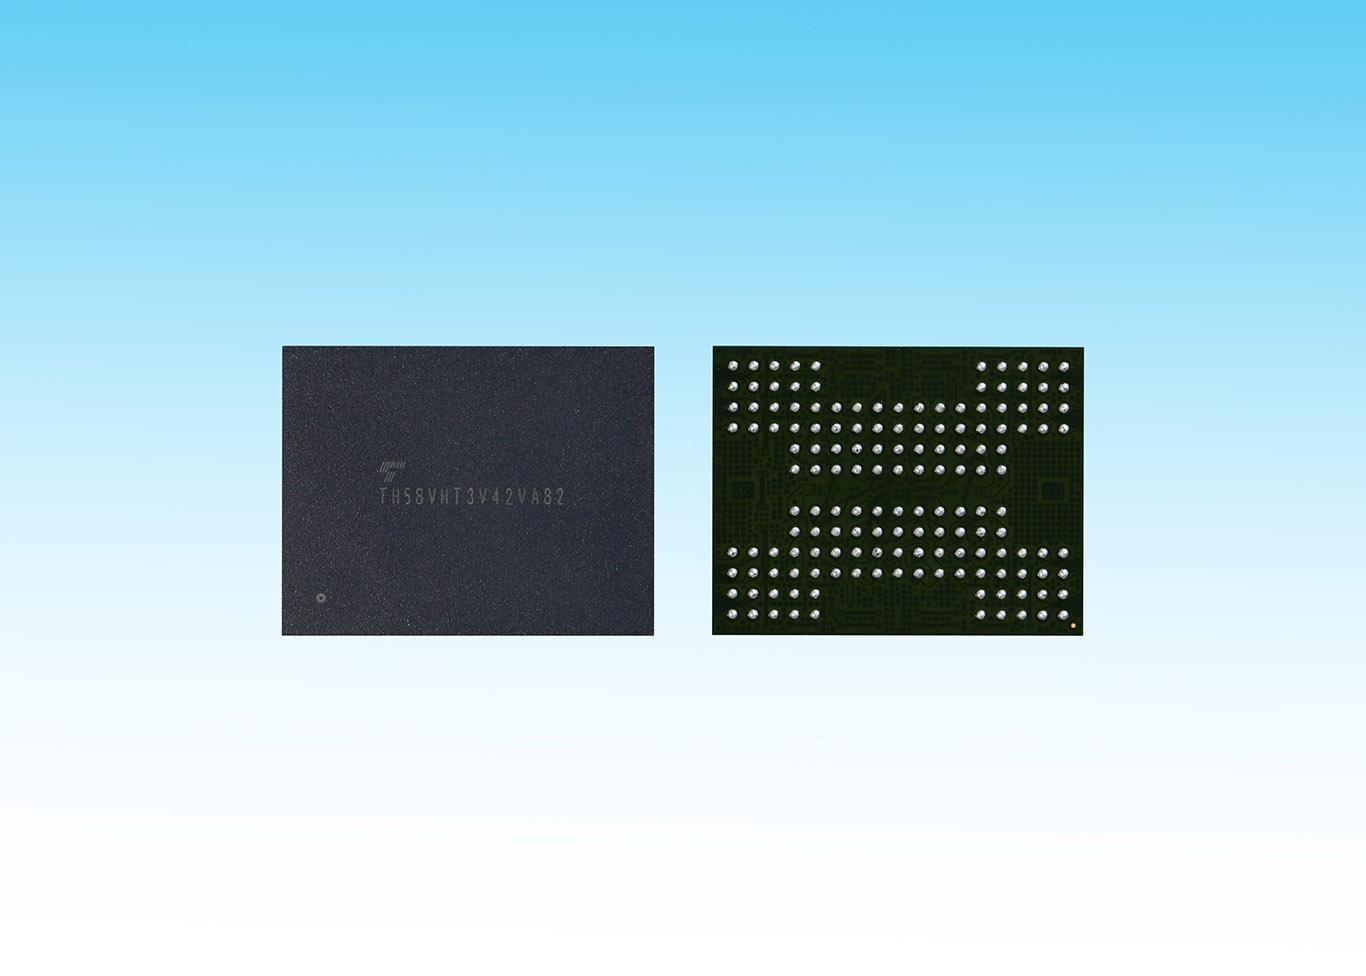 Toshiba Sampling 3d Nand With Tsvs